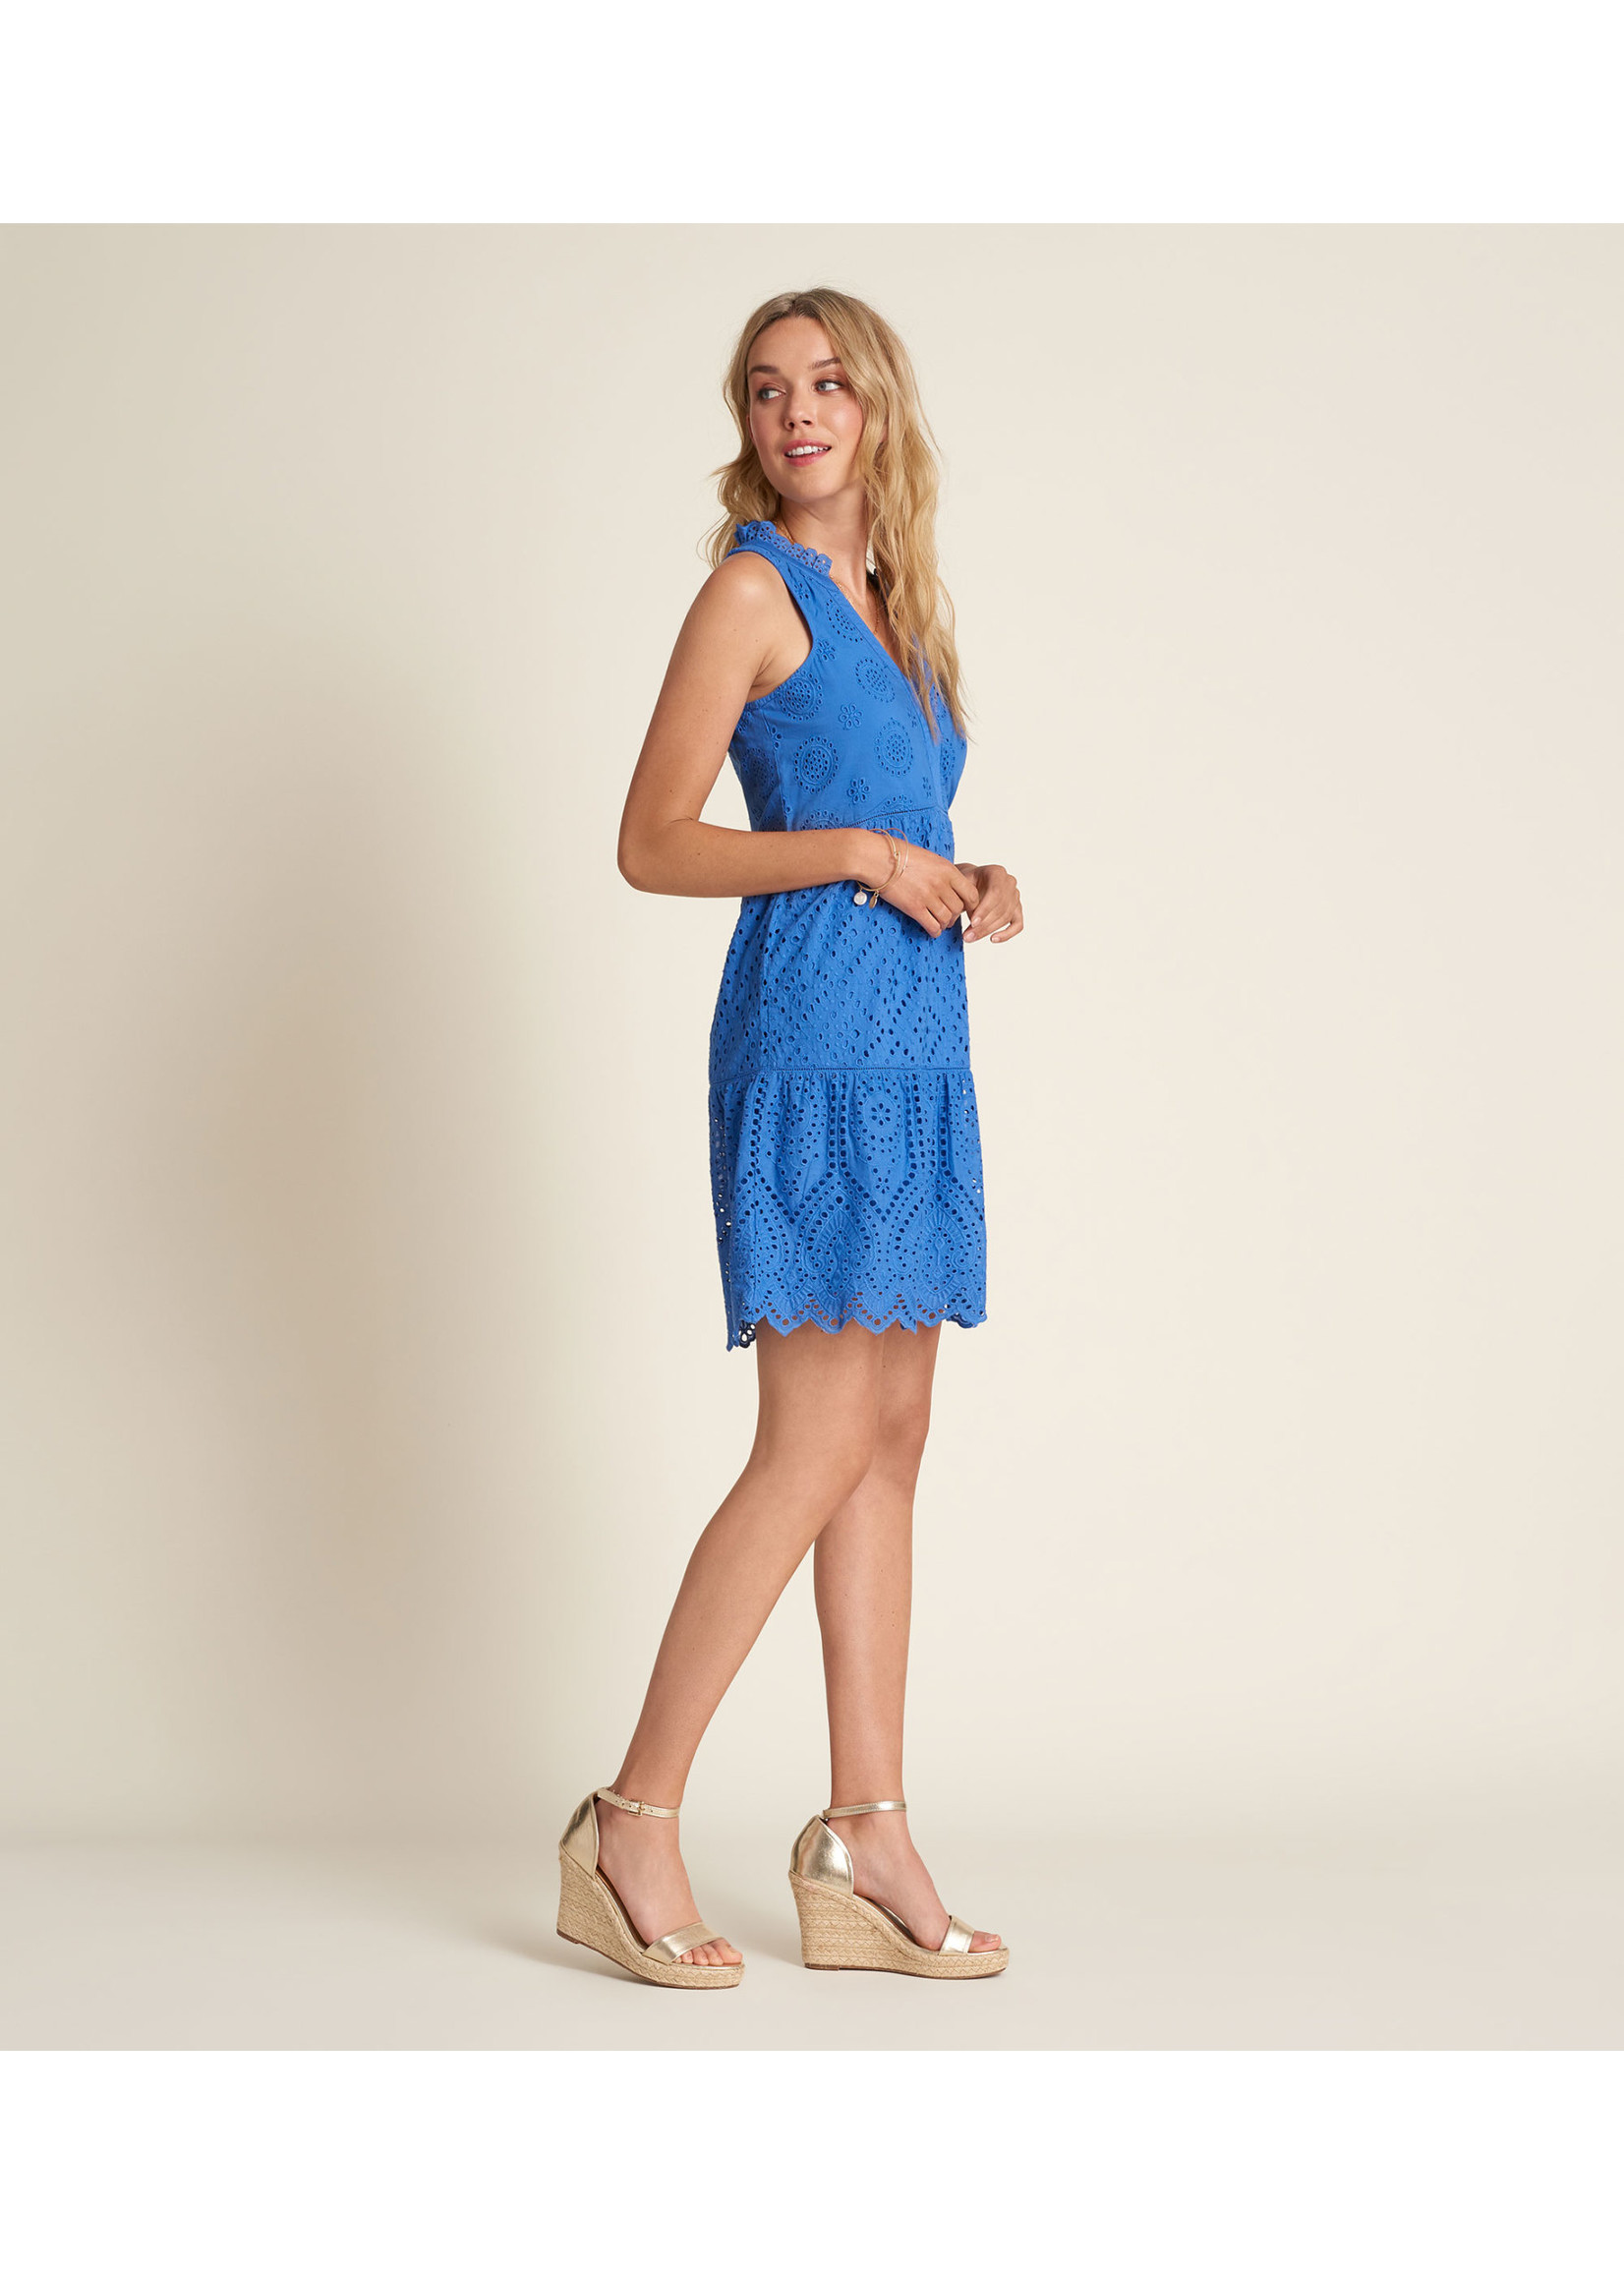 Hatley Lauren Eyelit White Dress *More Colors*